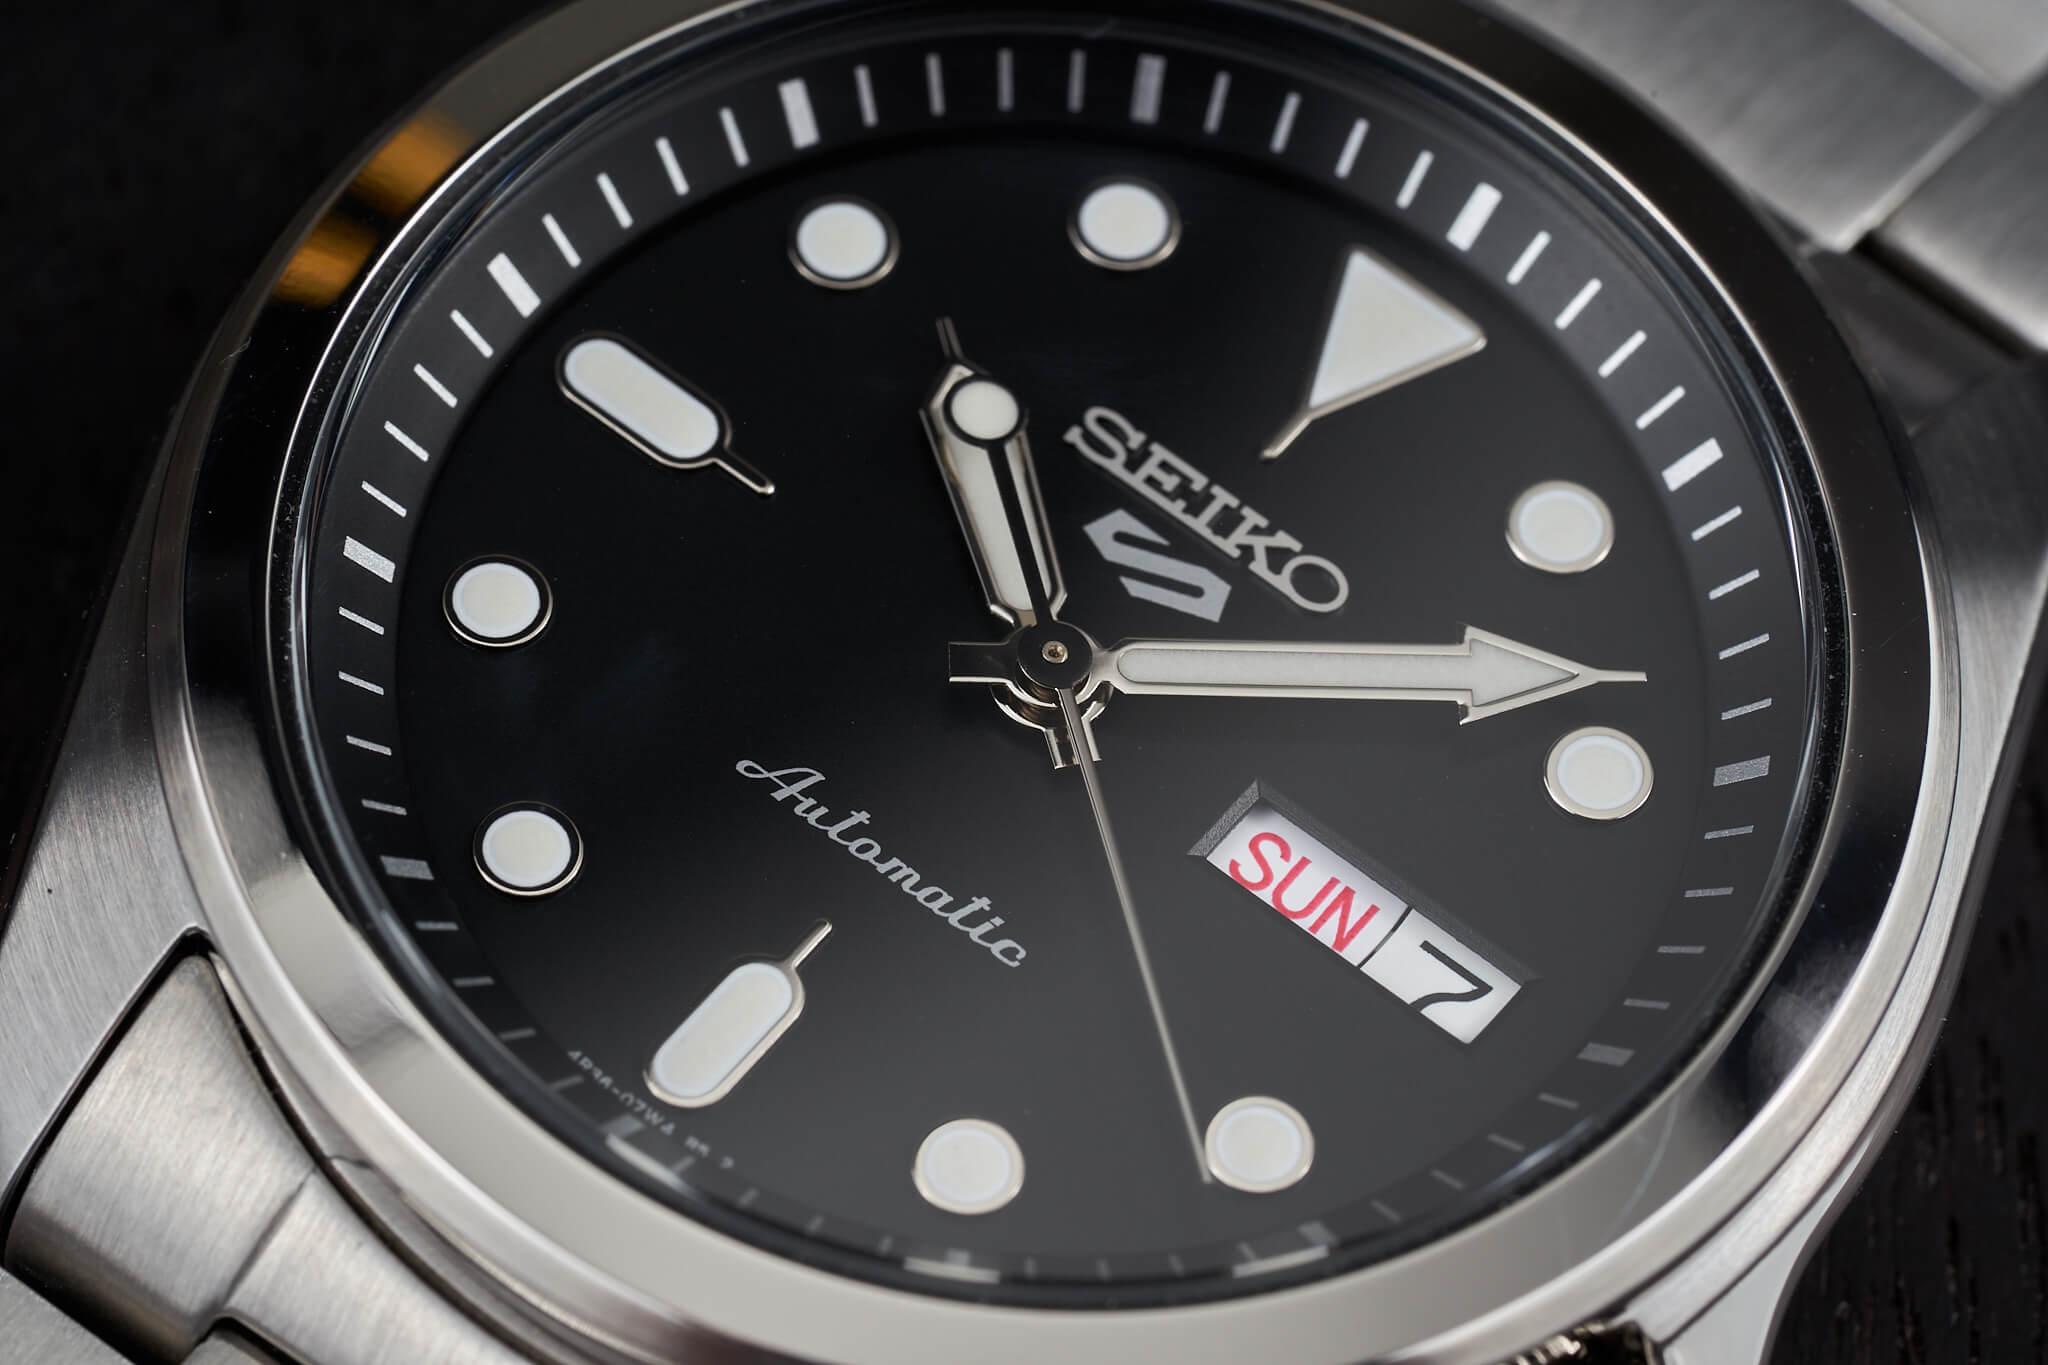 Seiko-5-Fixed-Bezel-SRPE55-SRPE51-SRPE53-SRPE57-15-1